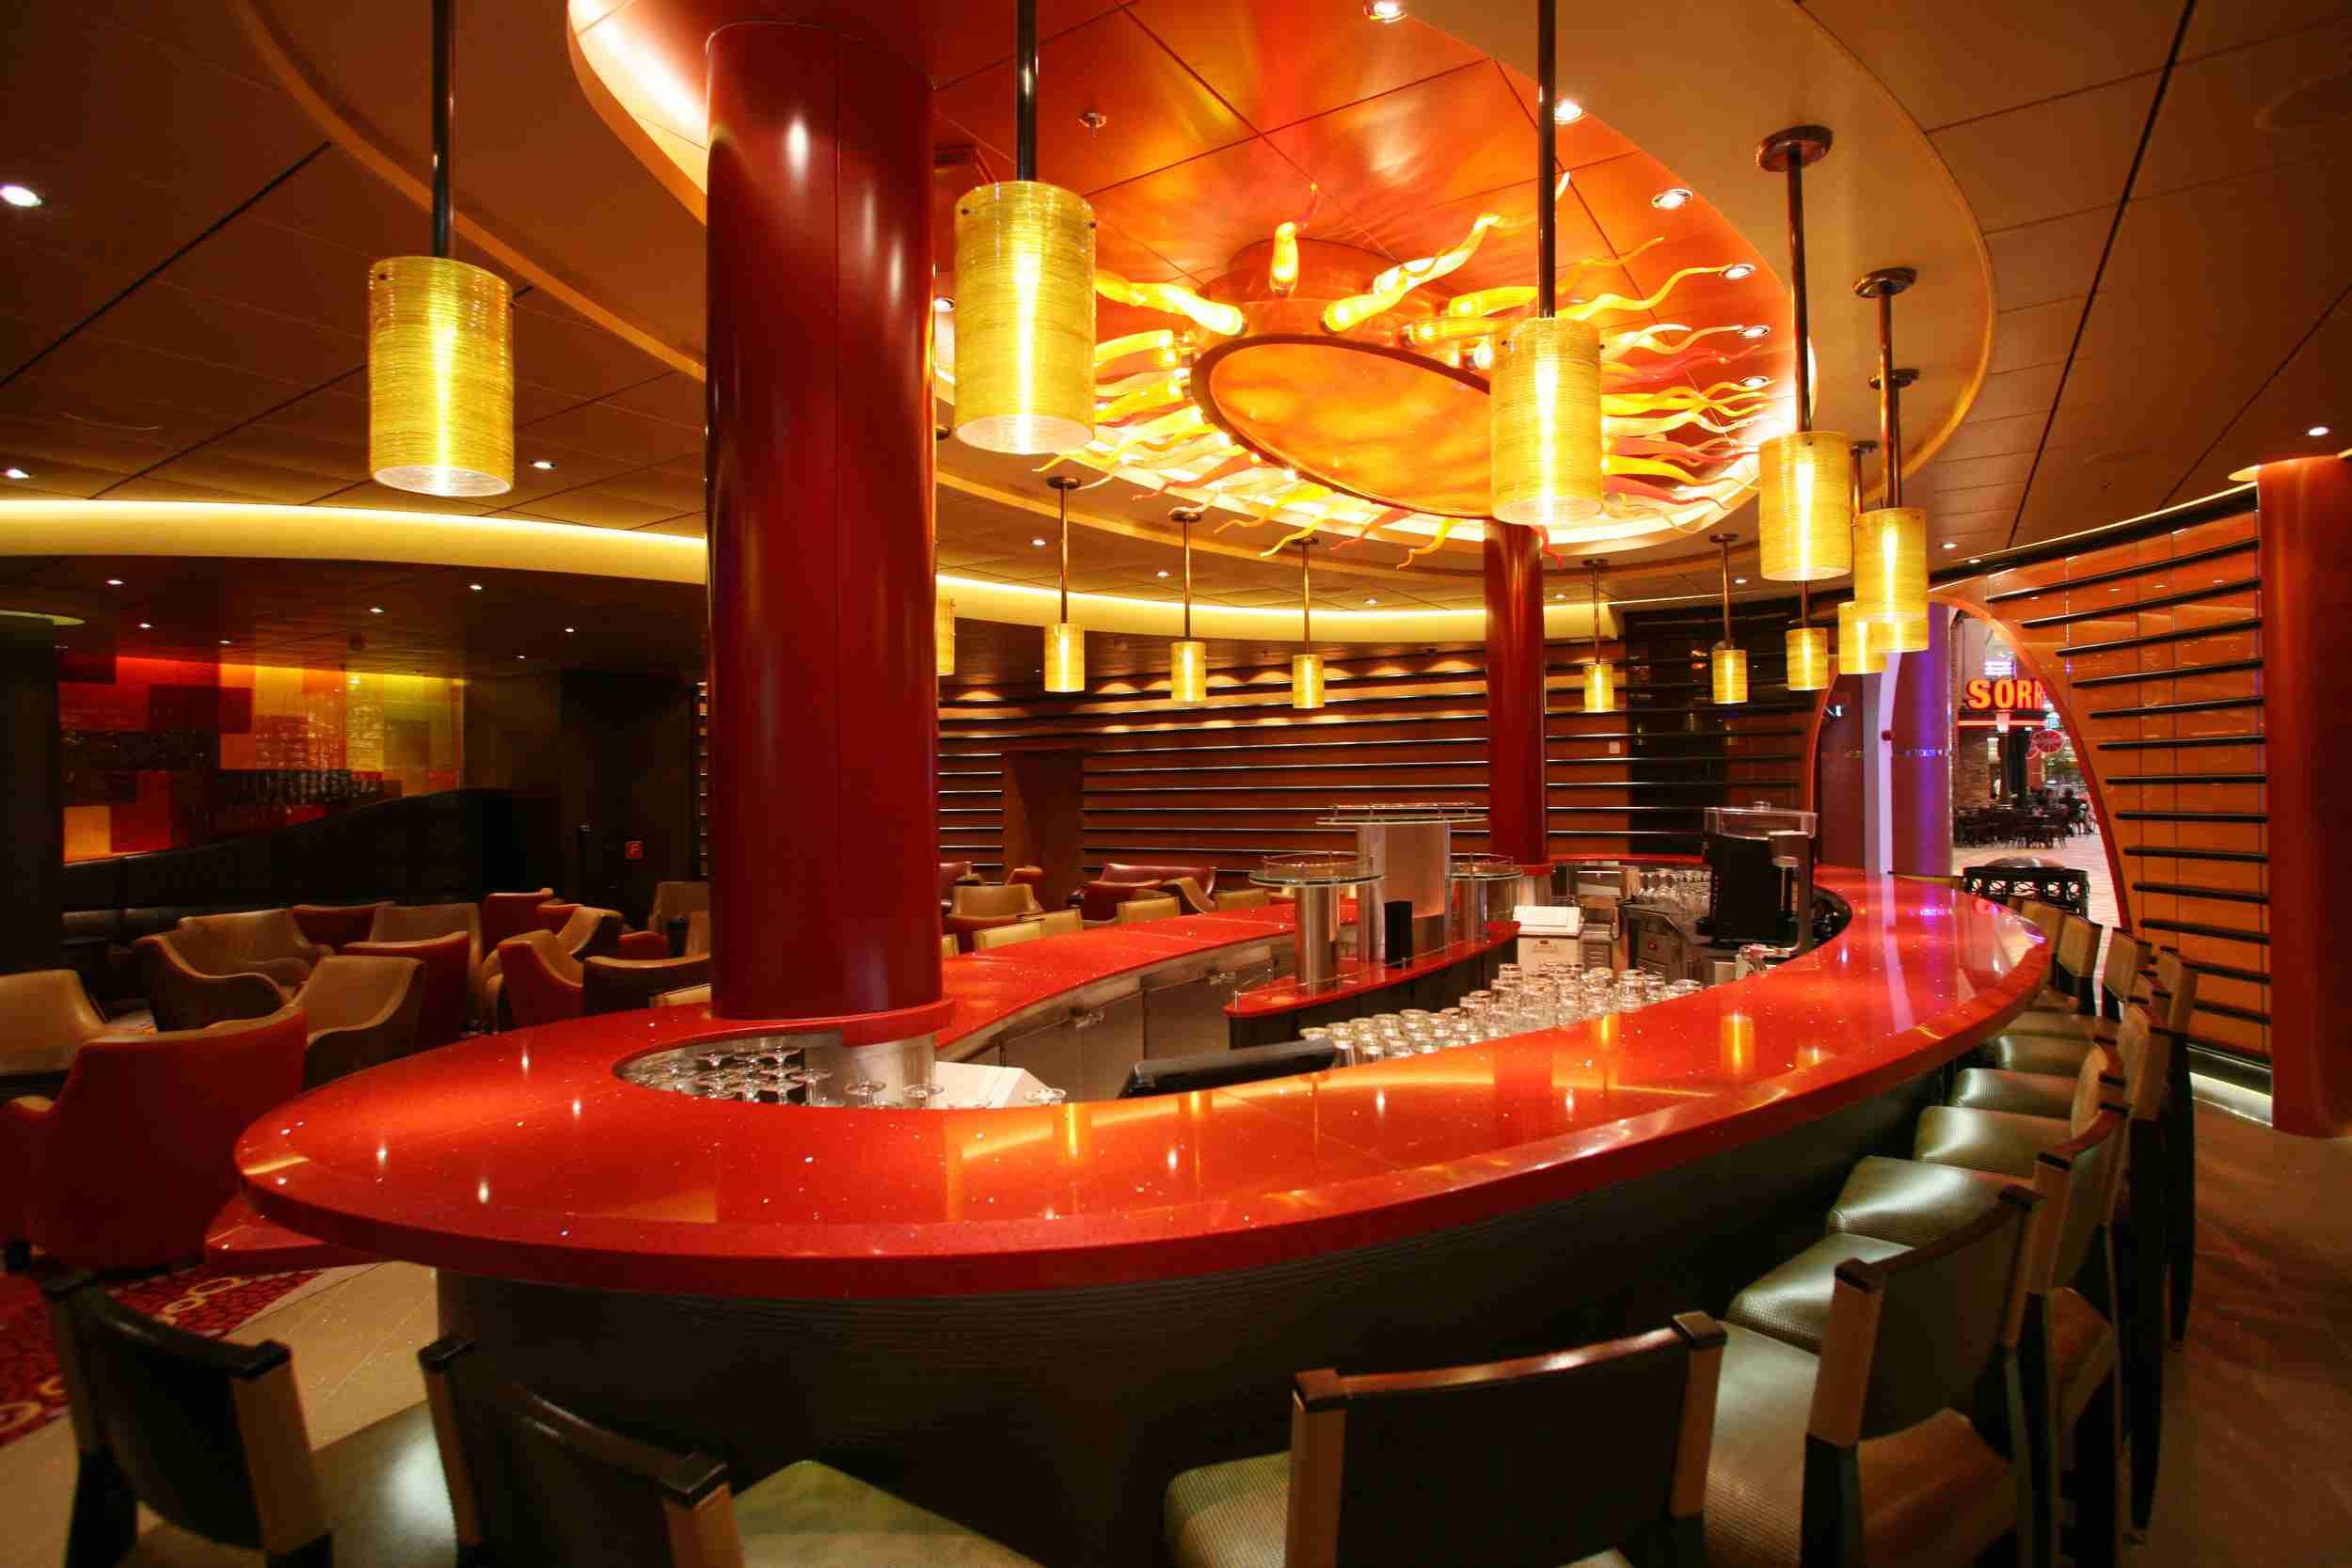 Bolero is a Latin-themed bar on the Allure of the Seas cruise ship